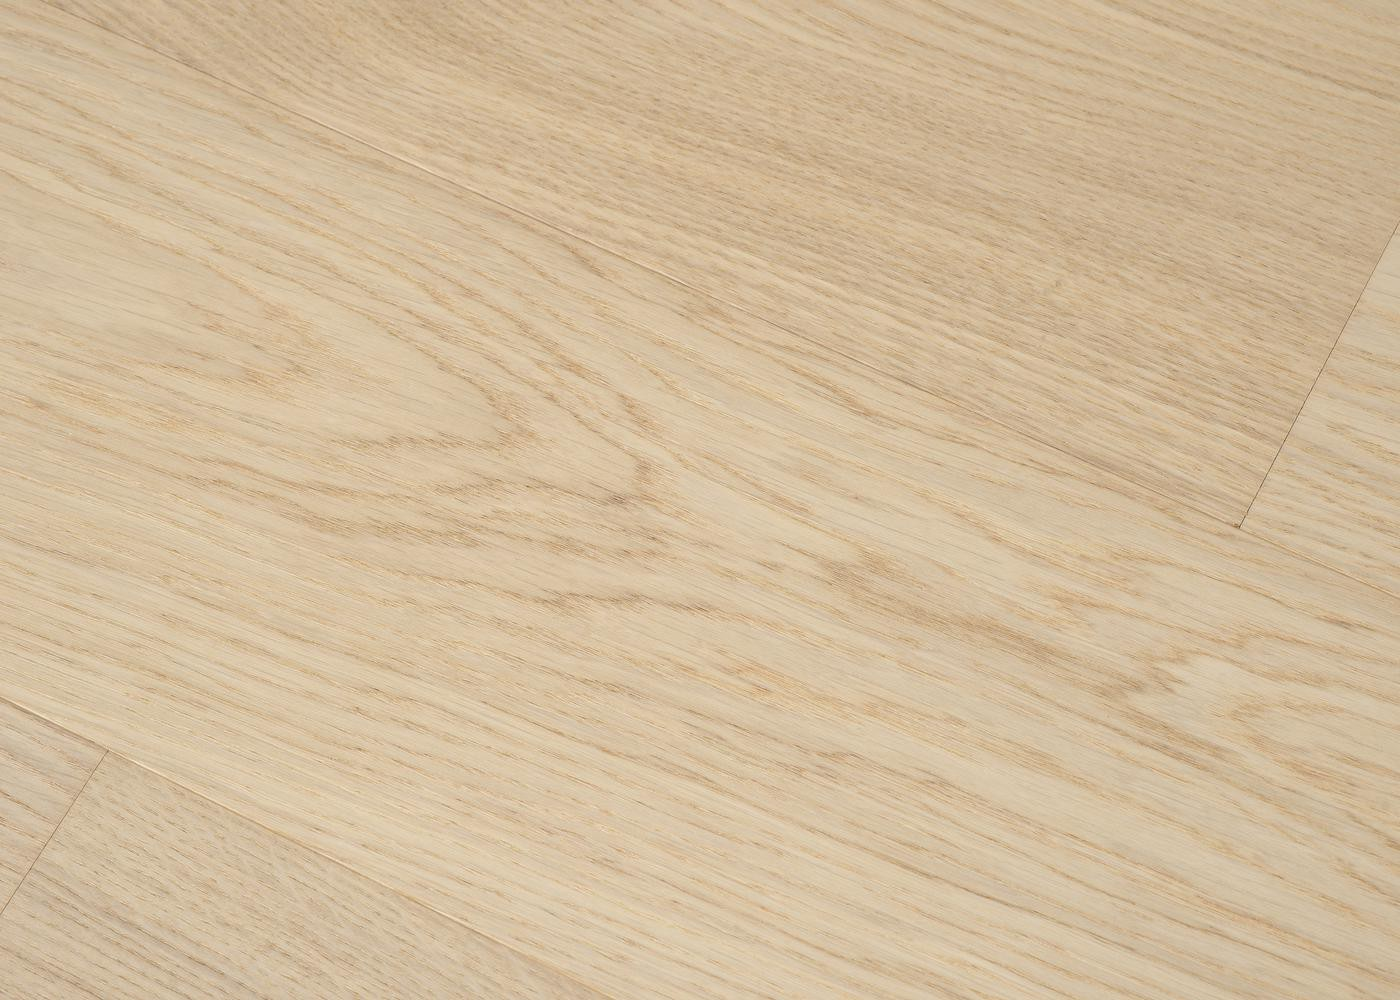 Parquet chêne contrecollé TURIN brossé vernis mat Select support HDF 10x92x1420